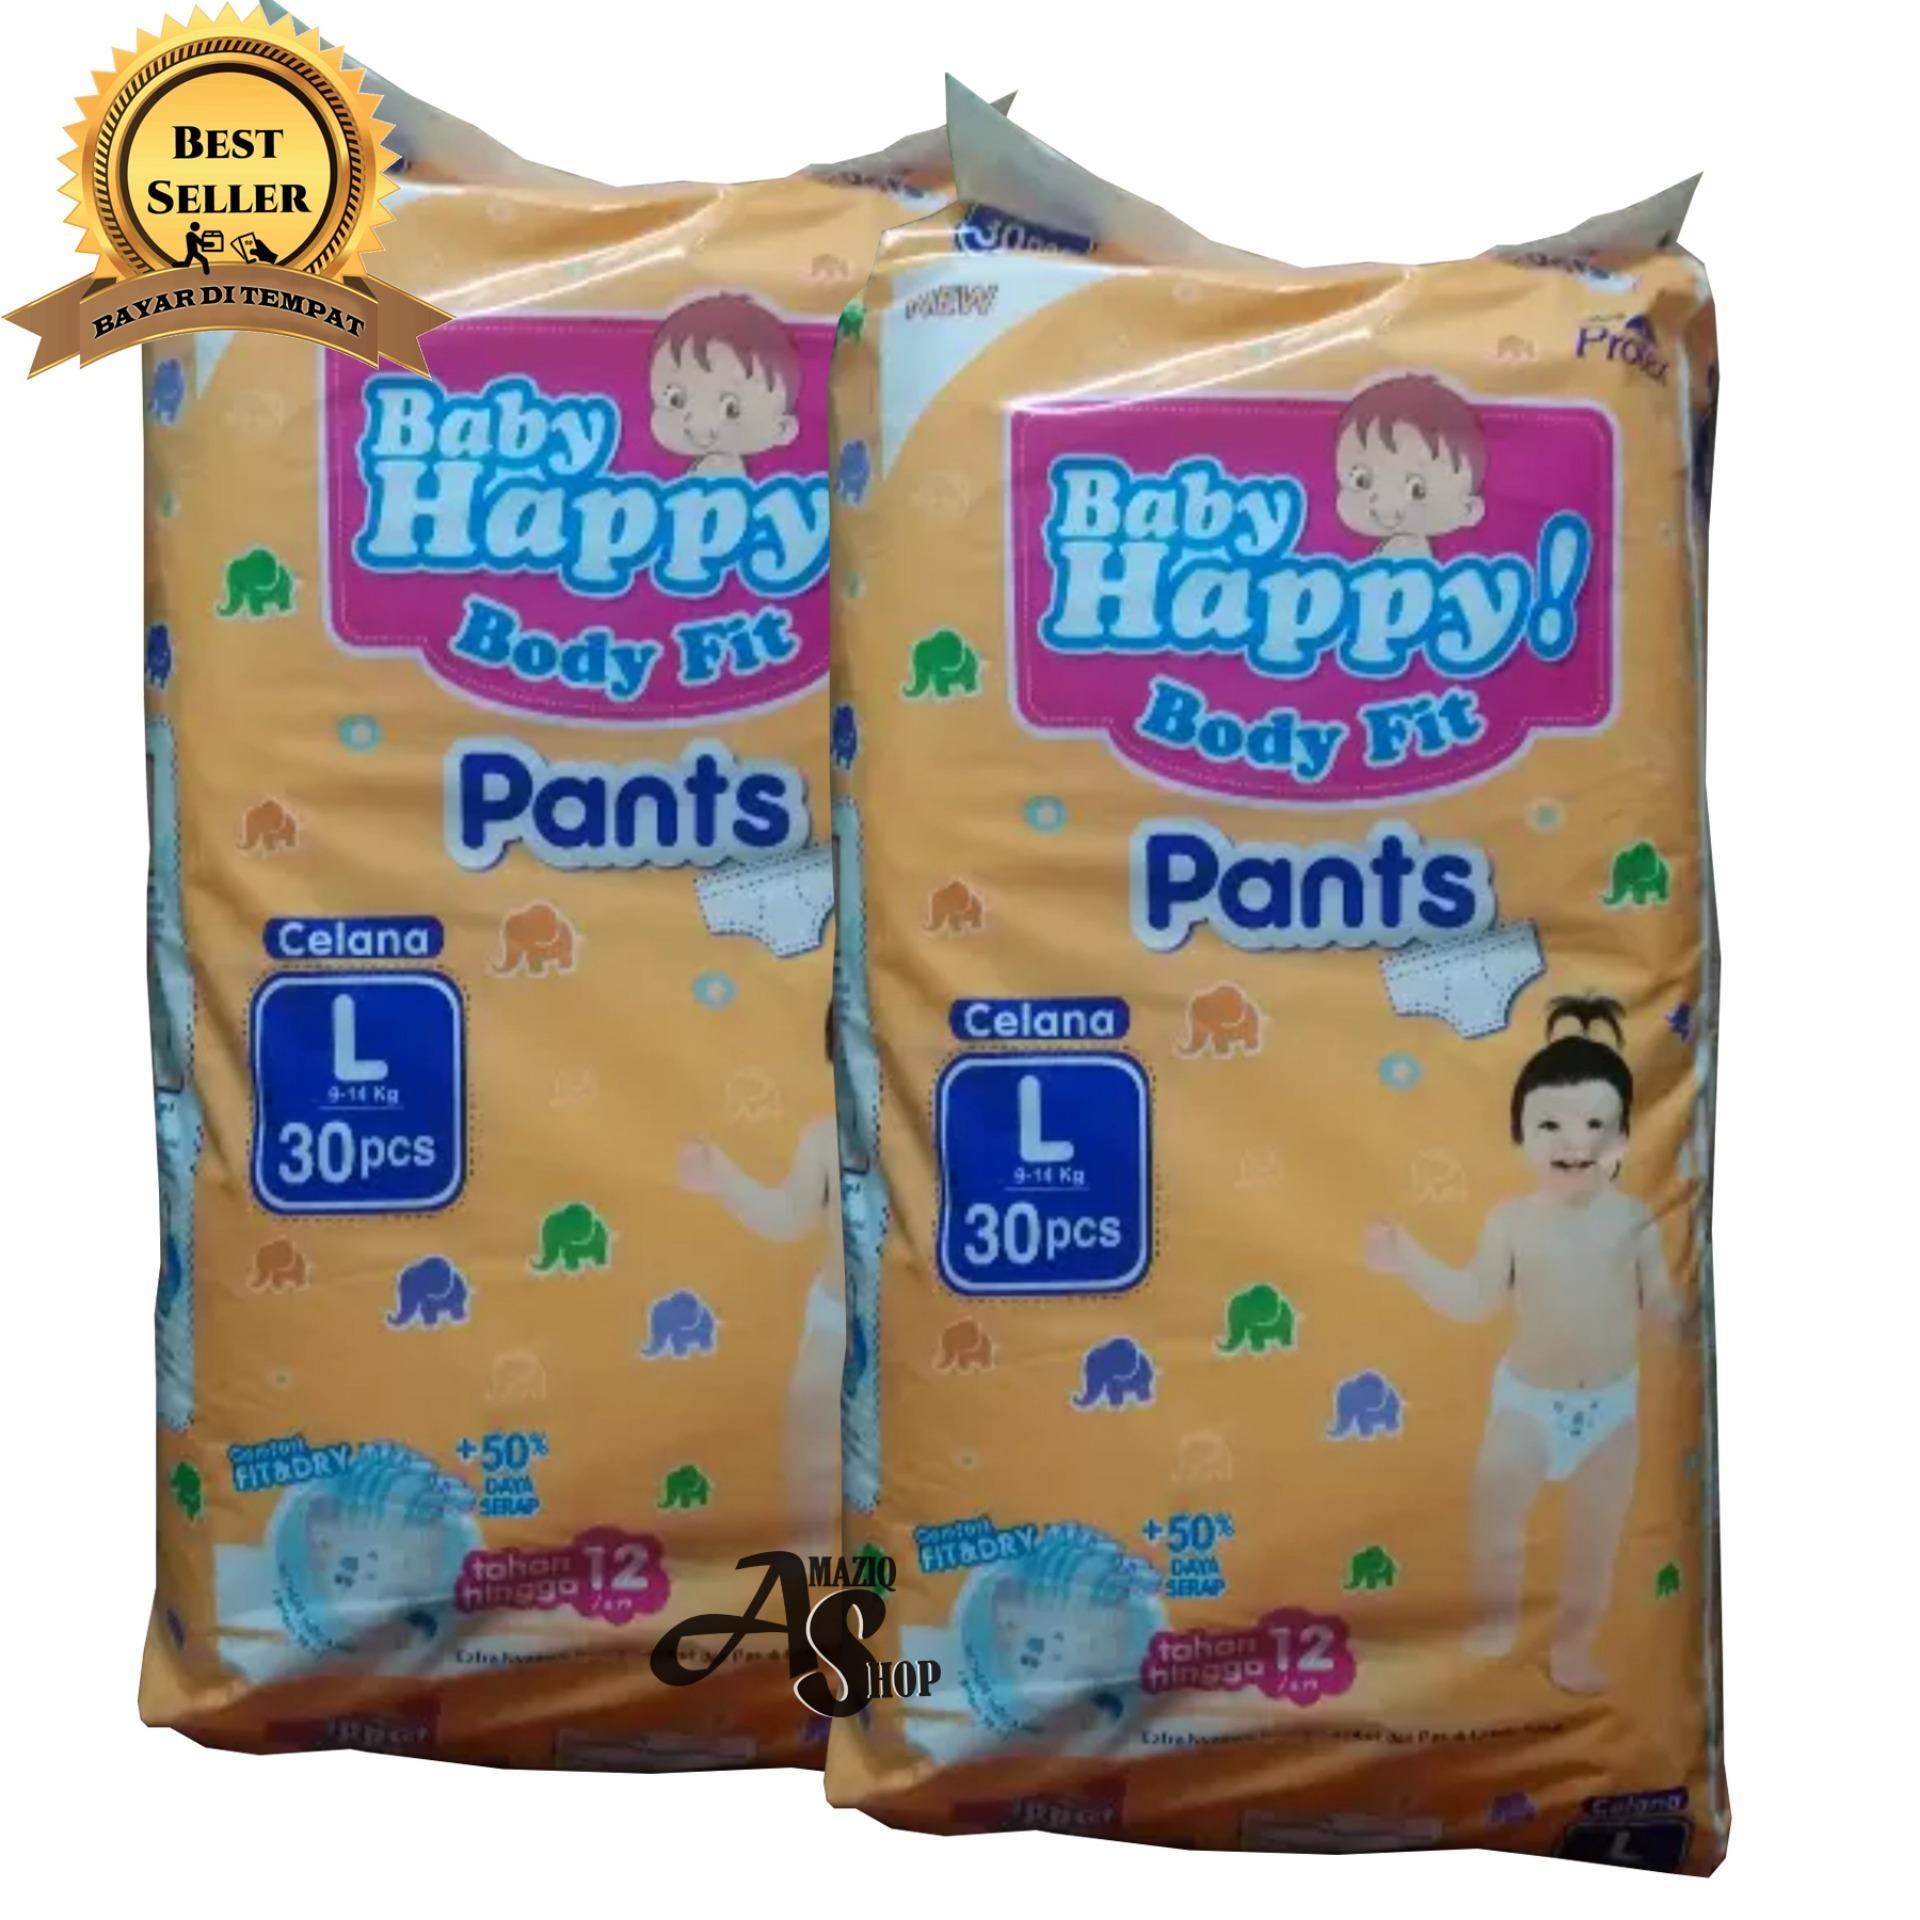 Cek Harga Baru Nepia Genki Pants Xxl18 2 Pack Gratis 1 Neppi L 30 Baby Happy Body Fit Isi